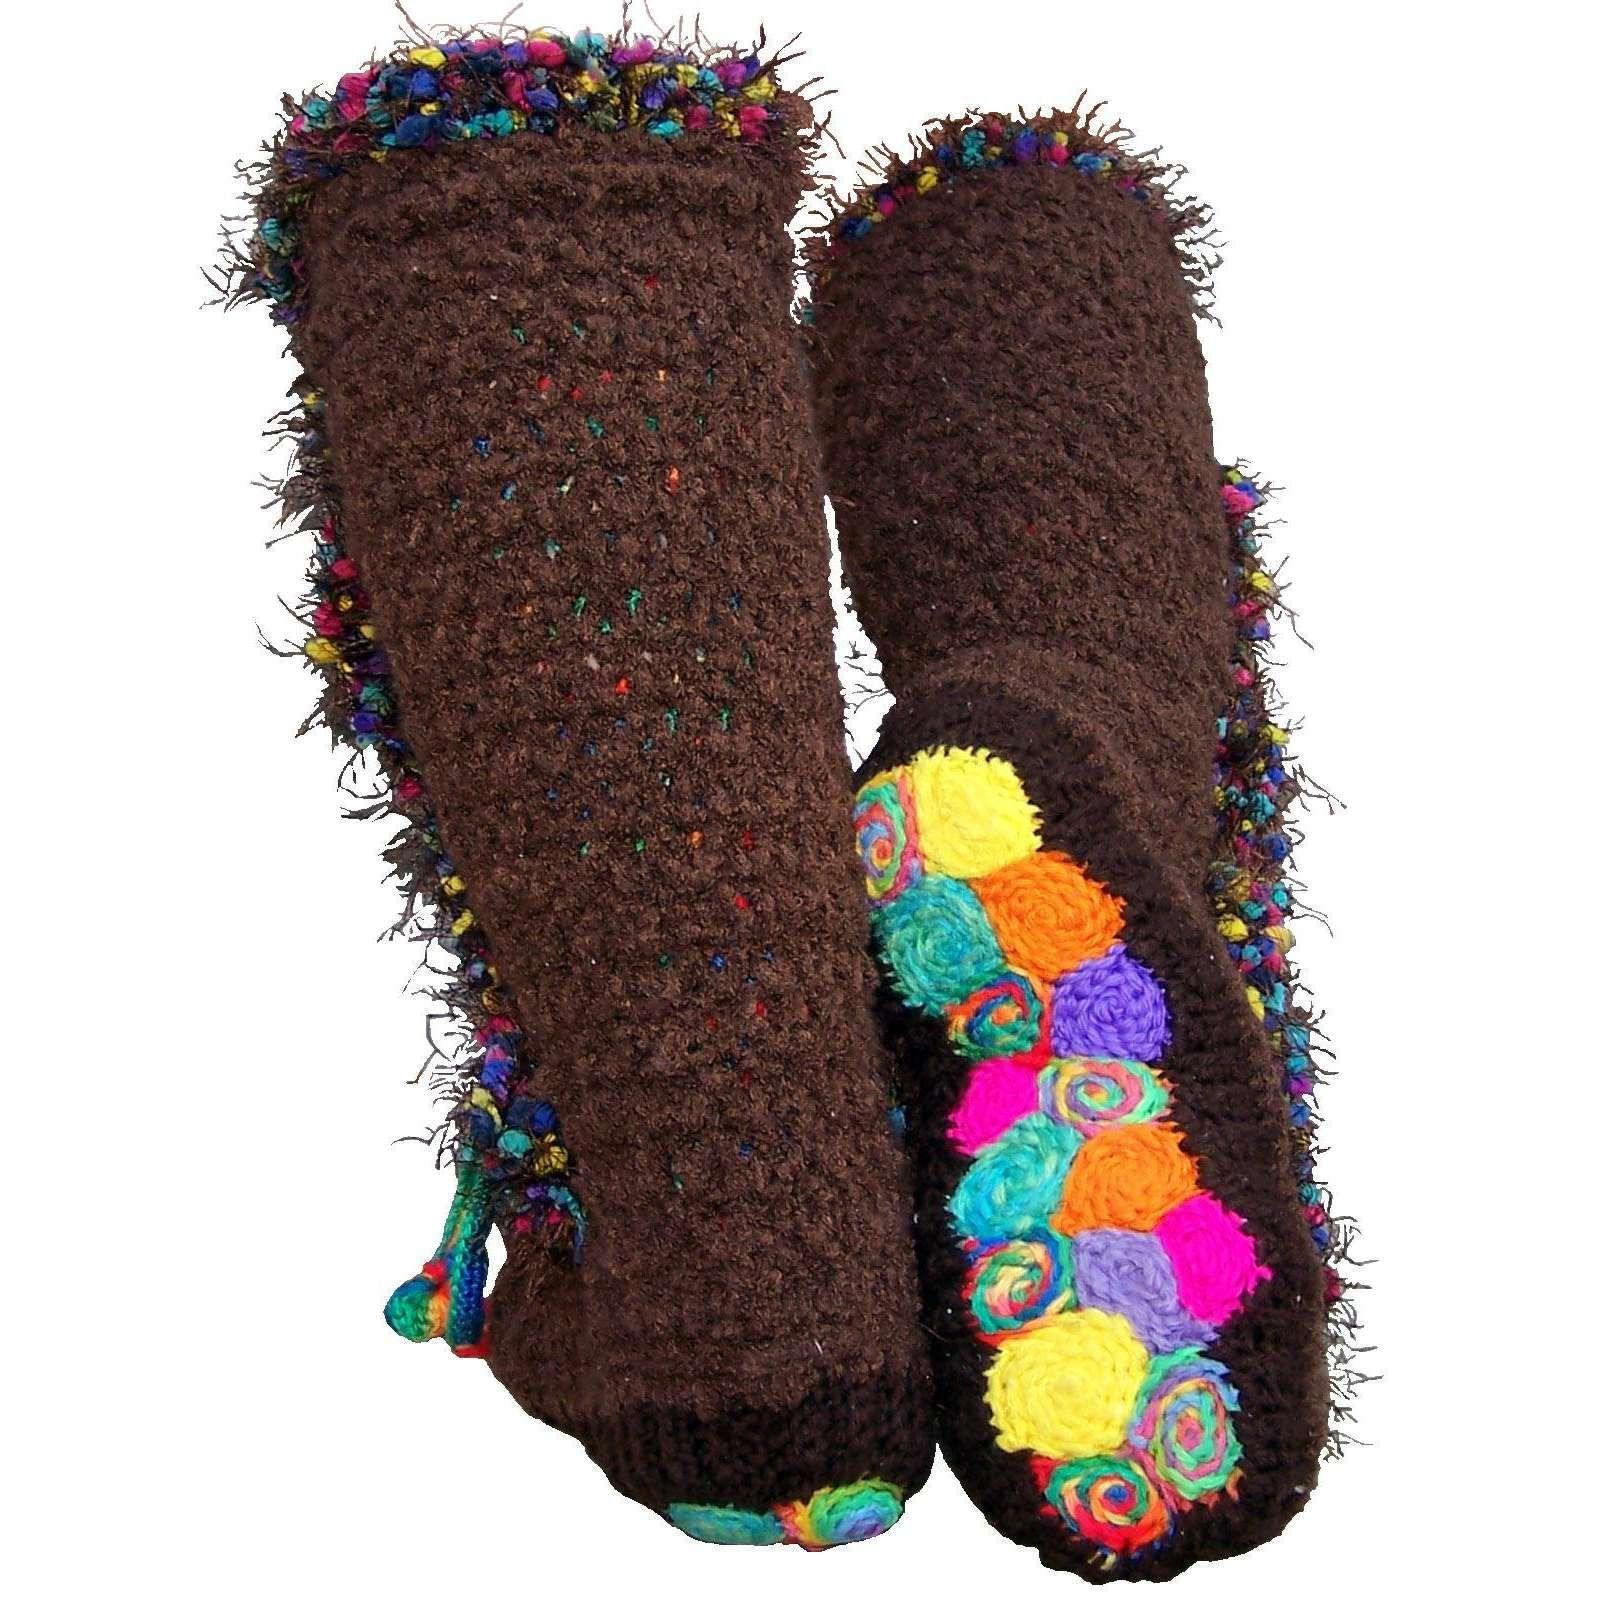 Free crochet mukluk pattern ravelry folksy slipper socks free crochet mukluk pattern ravelry folksy slipper socks crochet mukluk bootsmoccasins bankloansurffo Choice Image